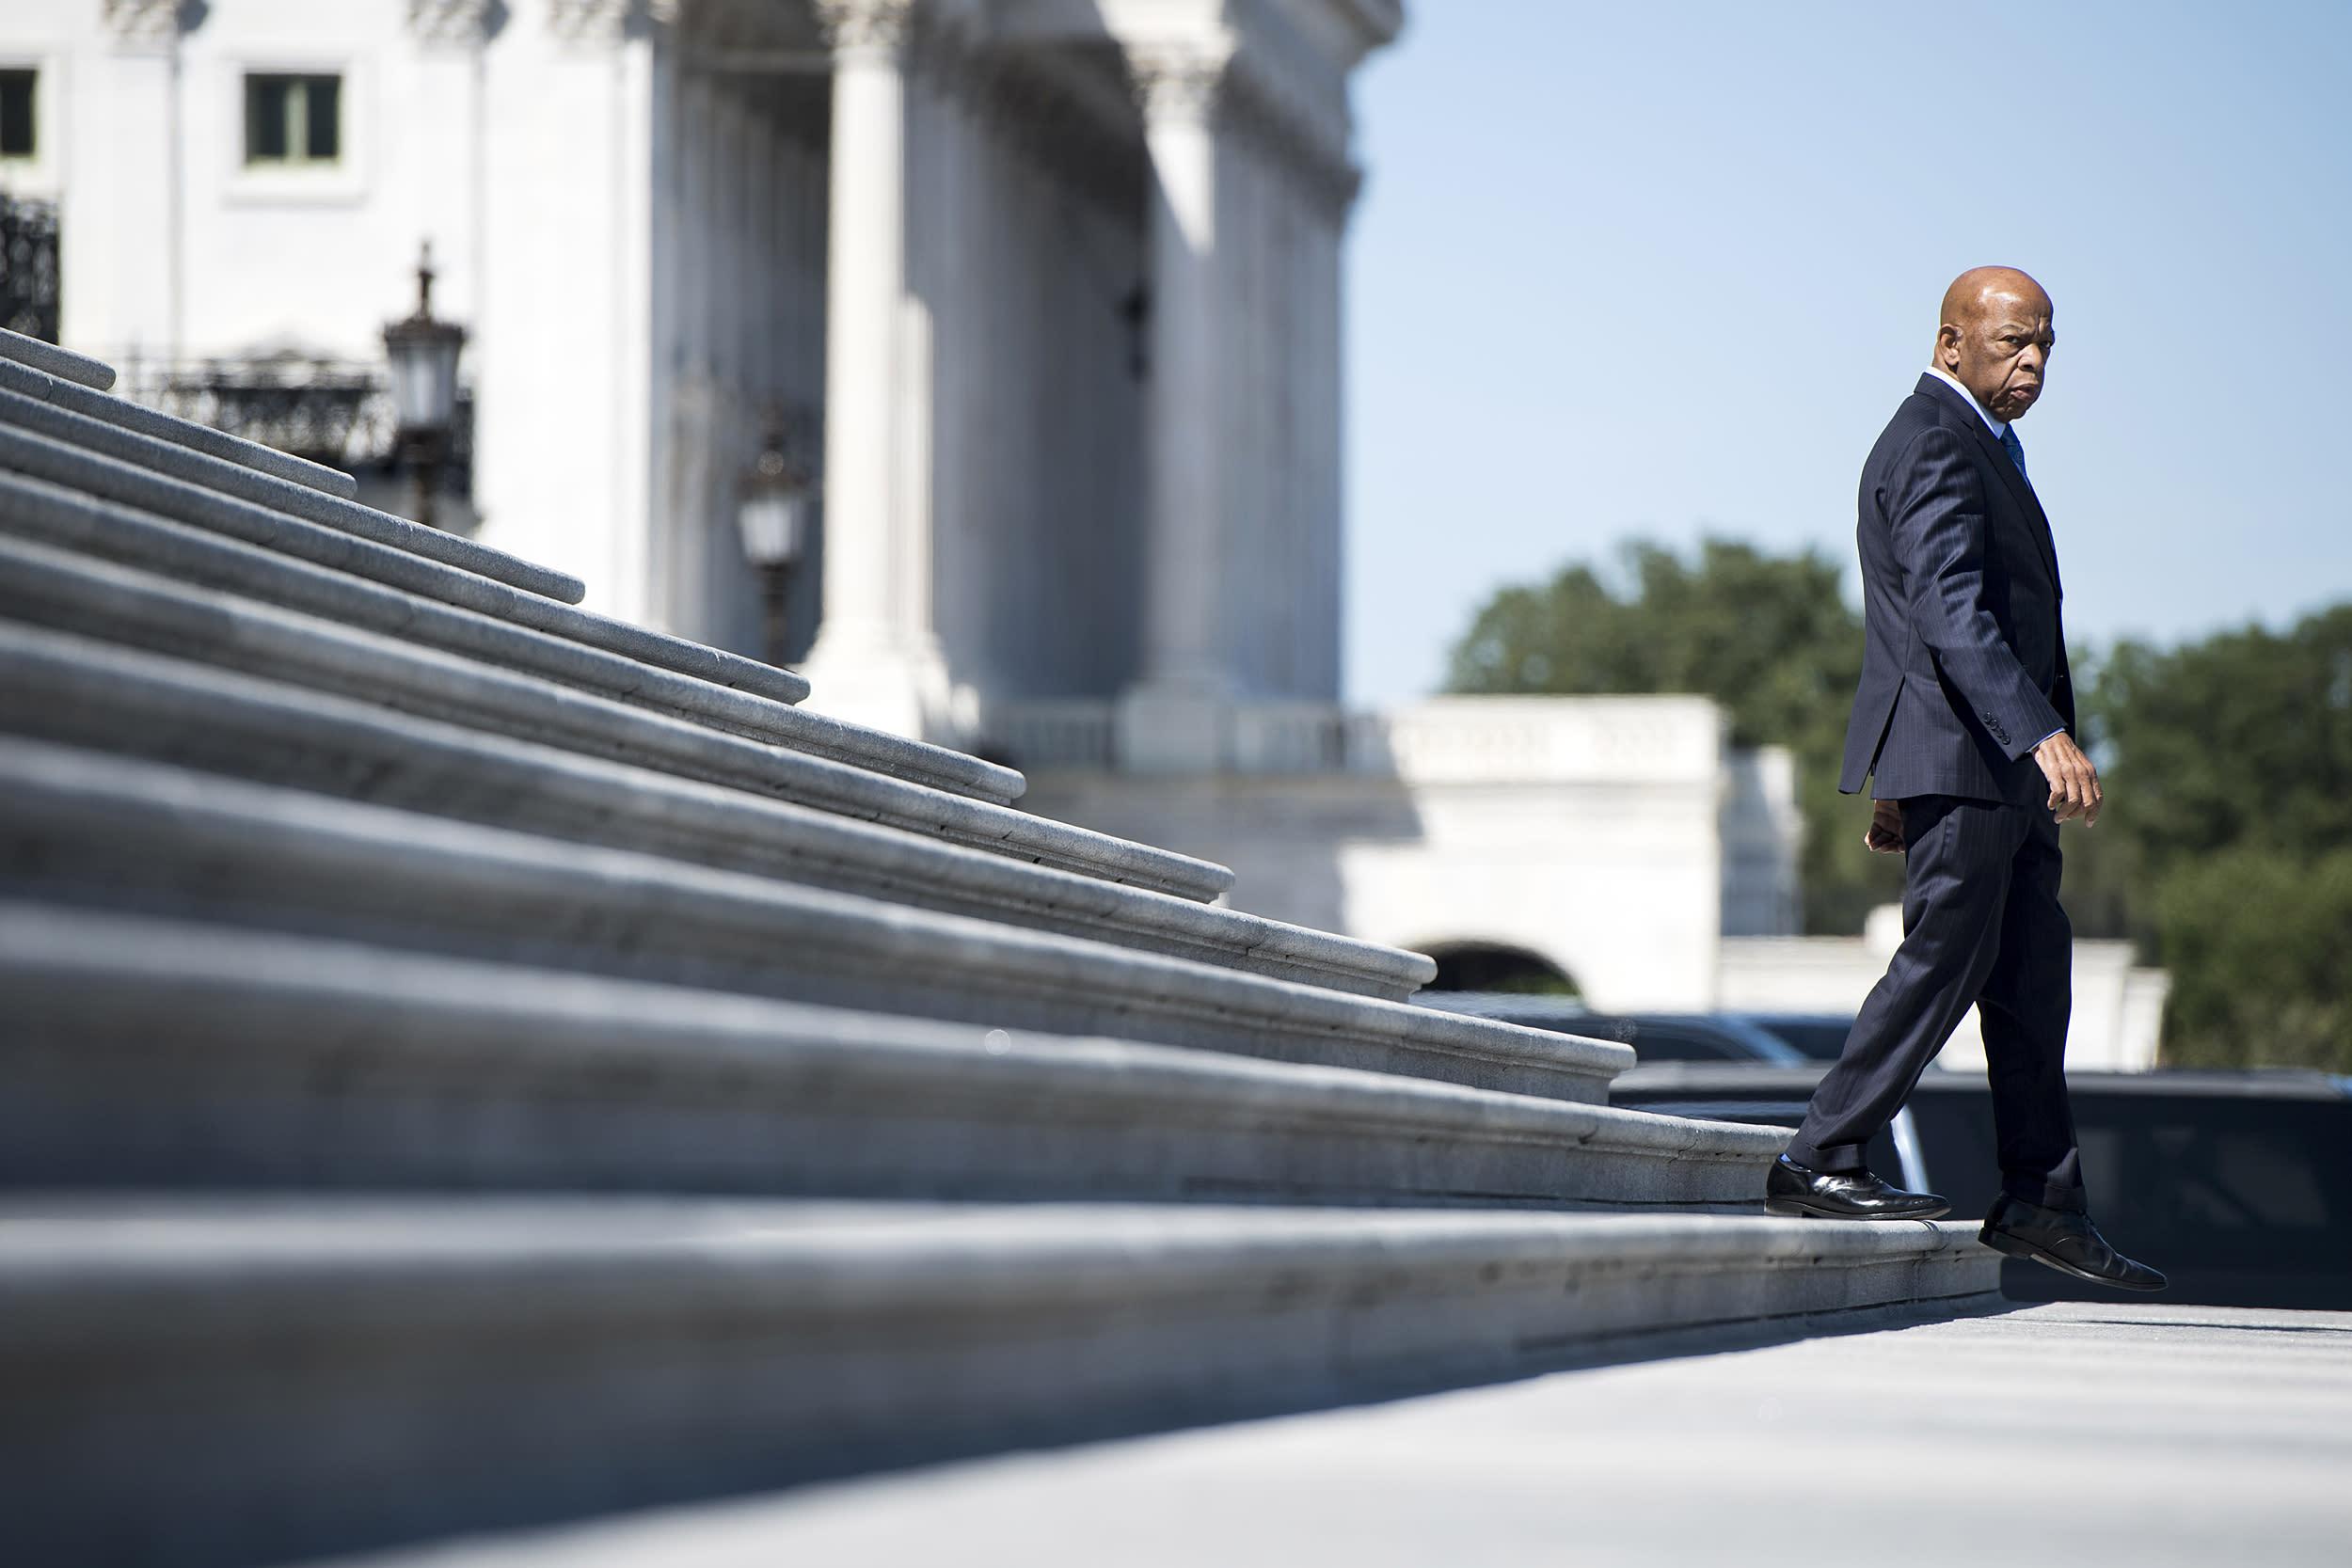 Rep. John Lewis to lie in state at Capitol next week